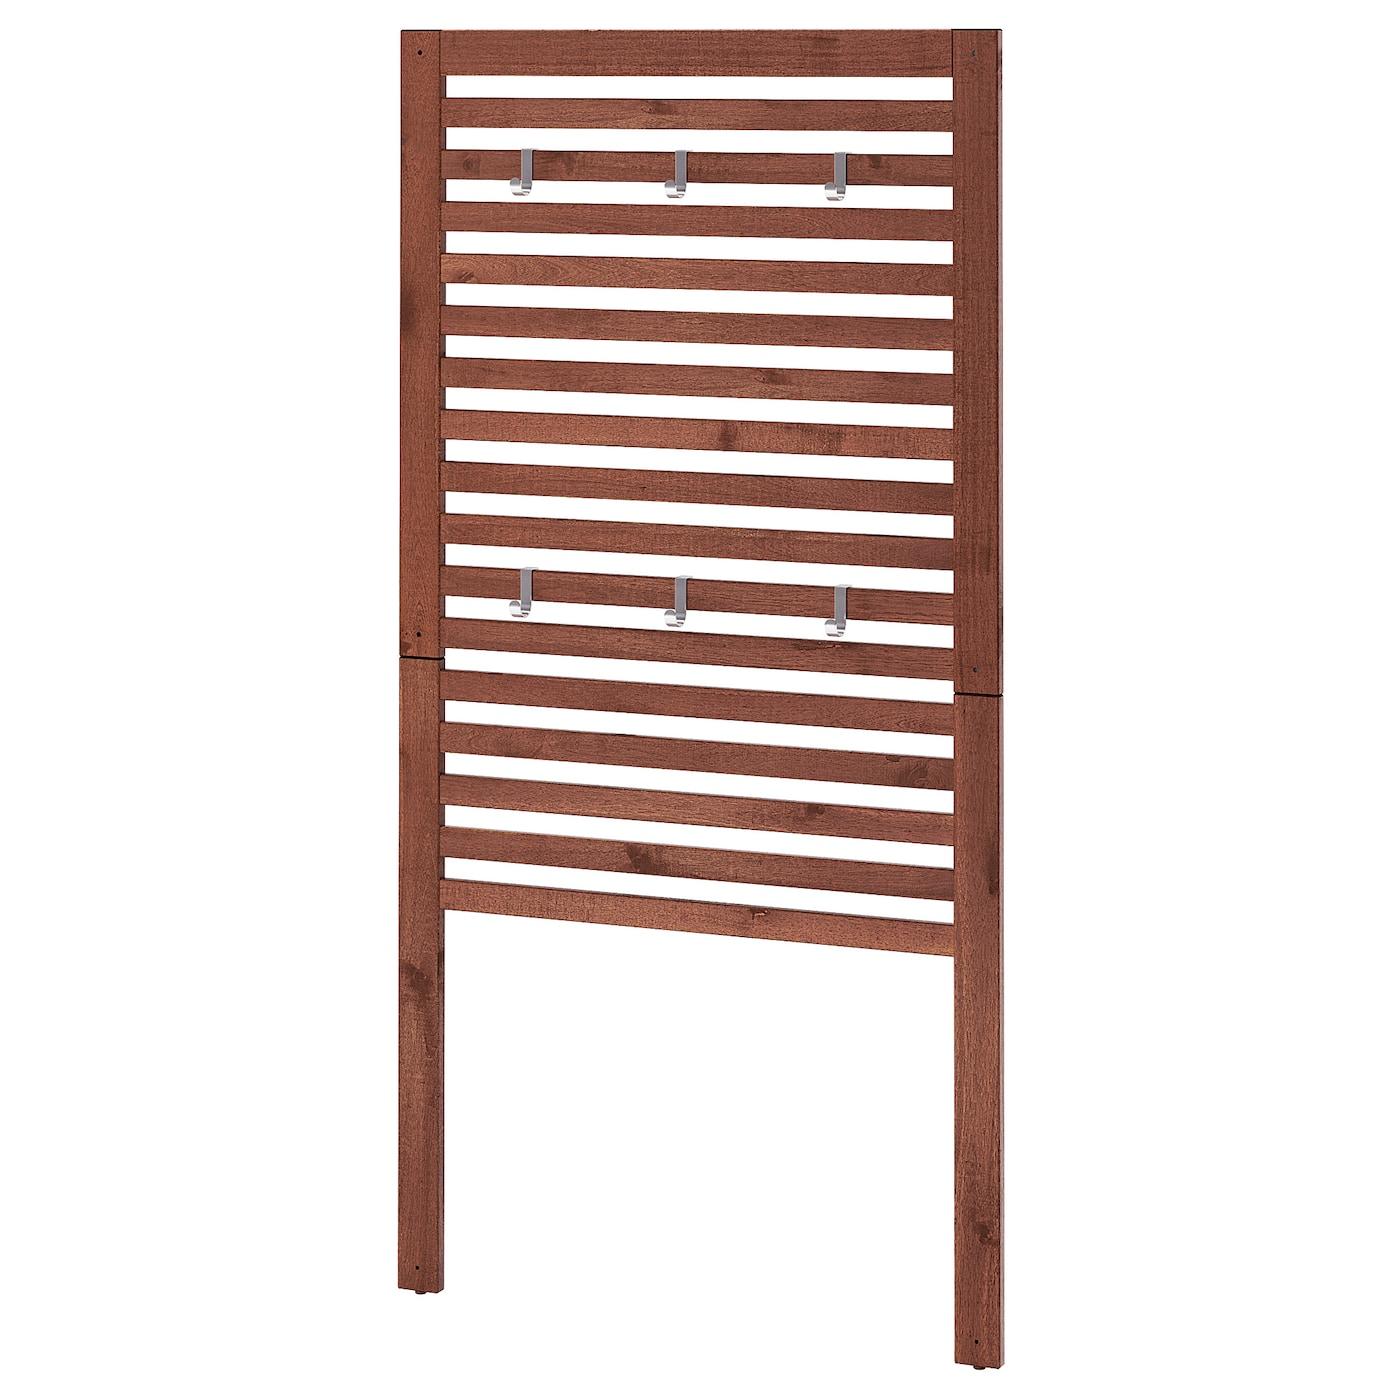 Applaro Wall Panel Outdoor Brown Stained Ikea Switzerland